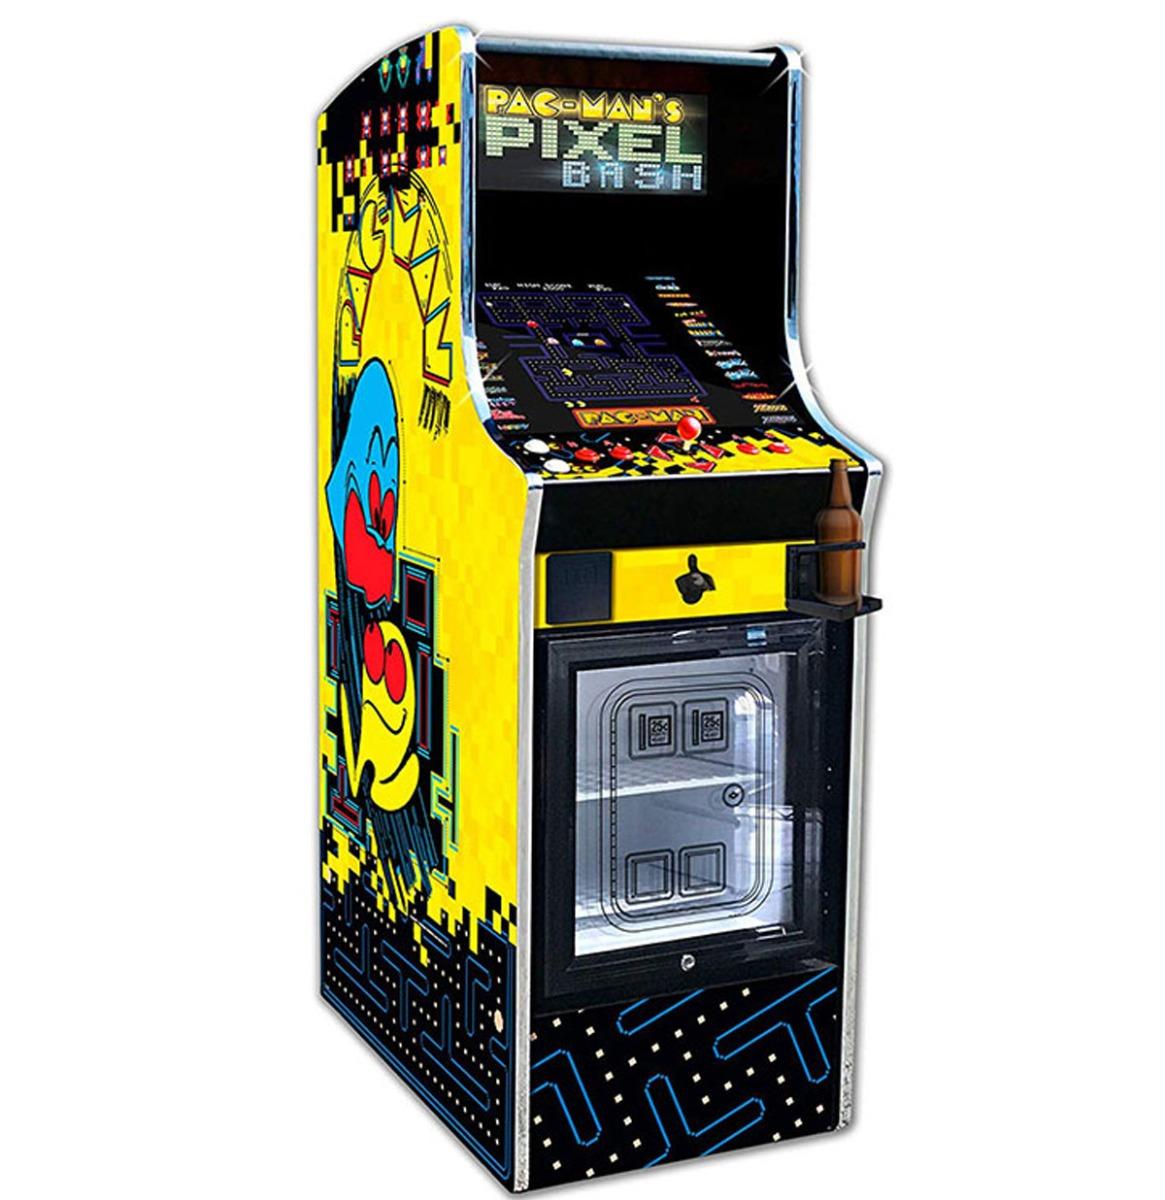 Namco Pac-Man's Pixel Bash Arcade Spel Home Upright Game Met Koelkast 32 Spellen